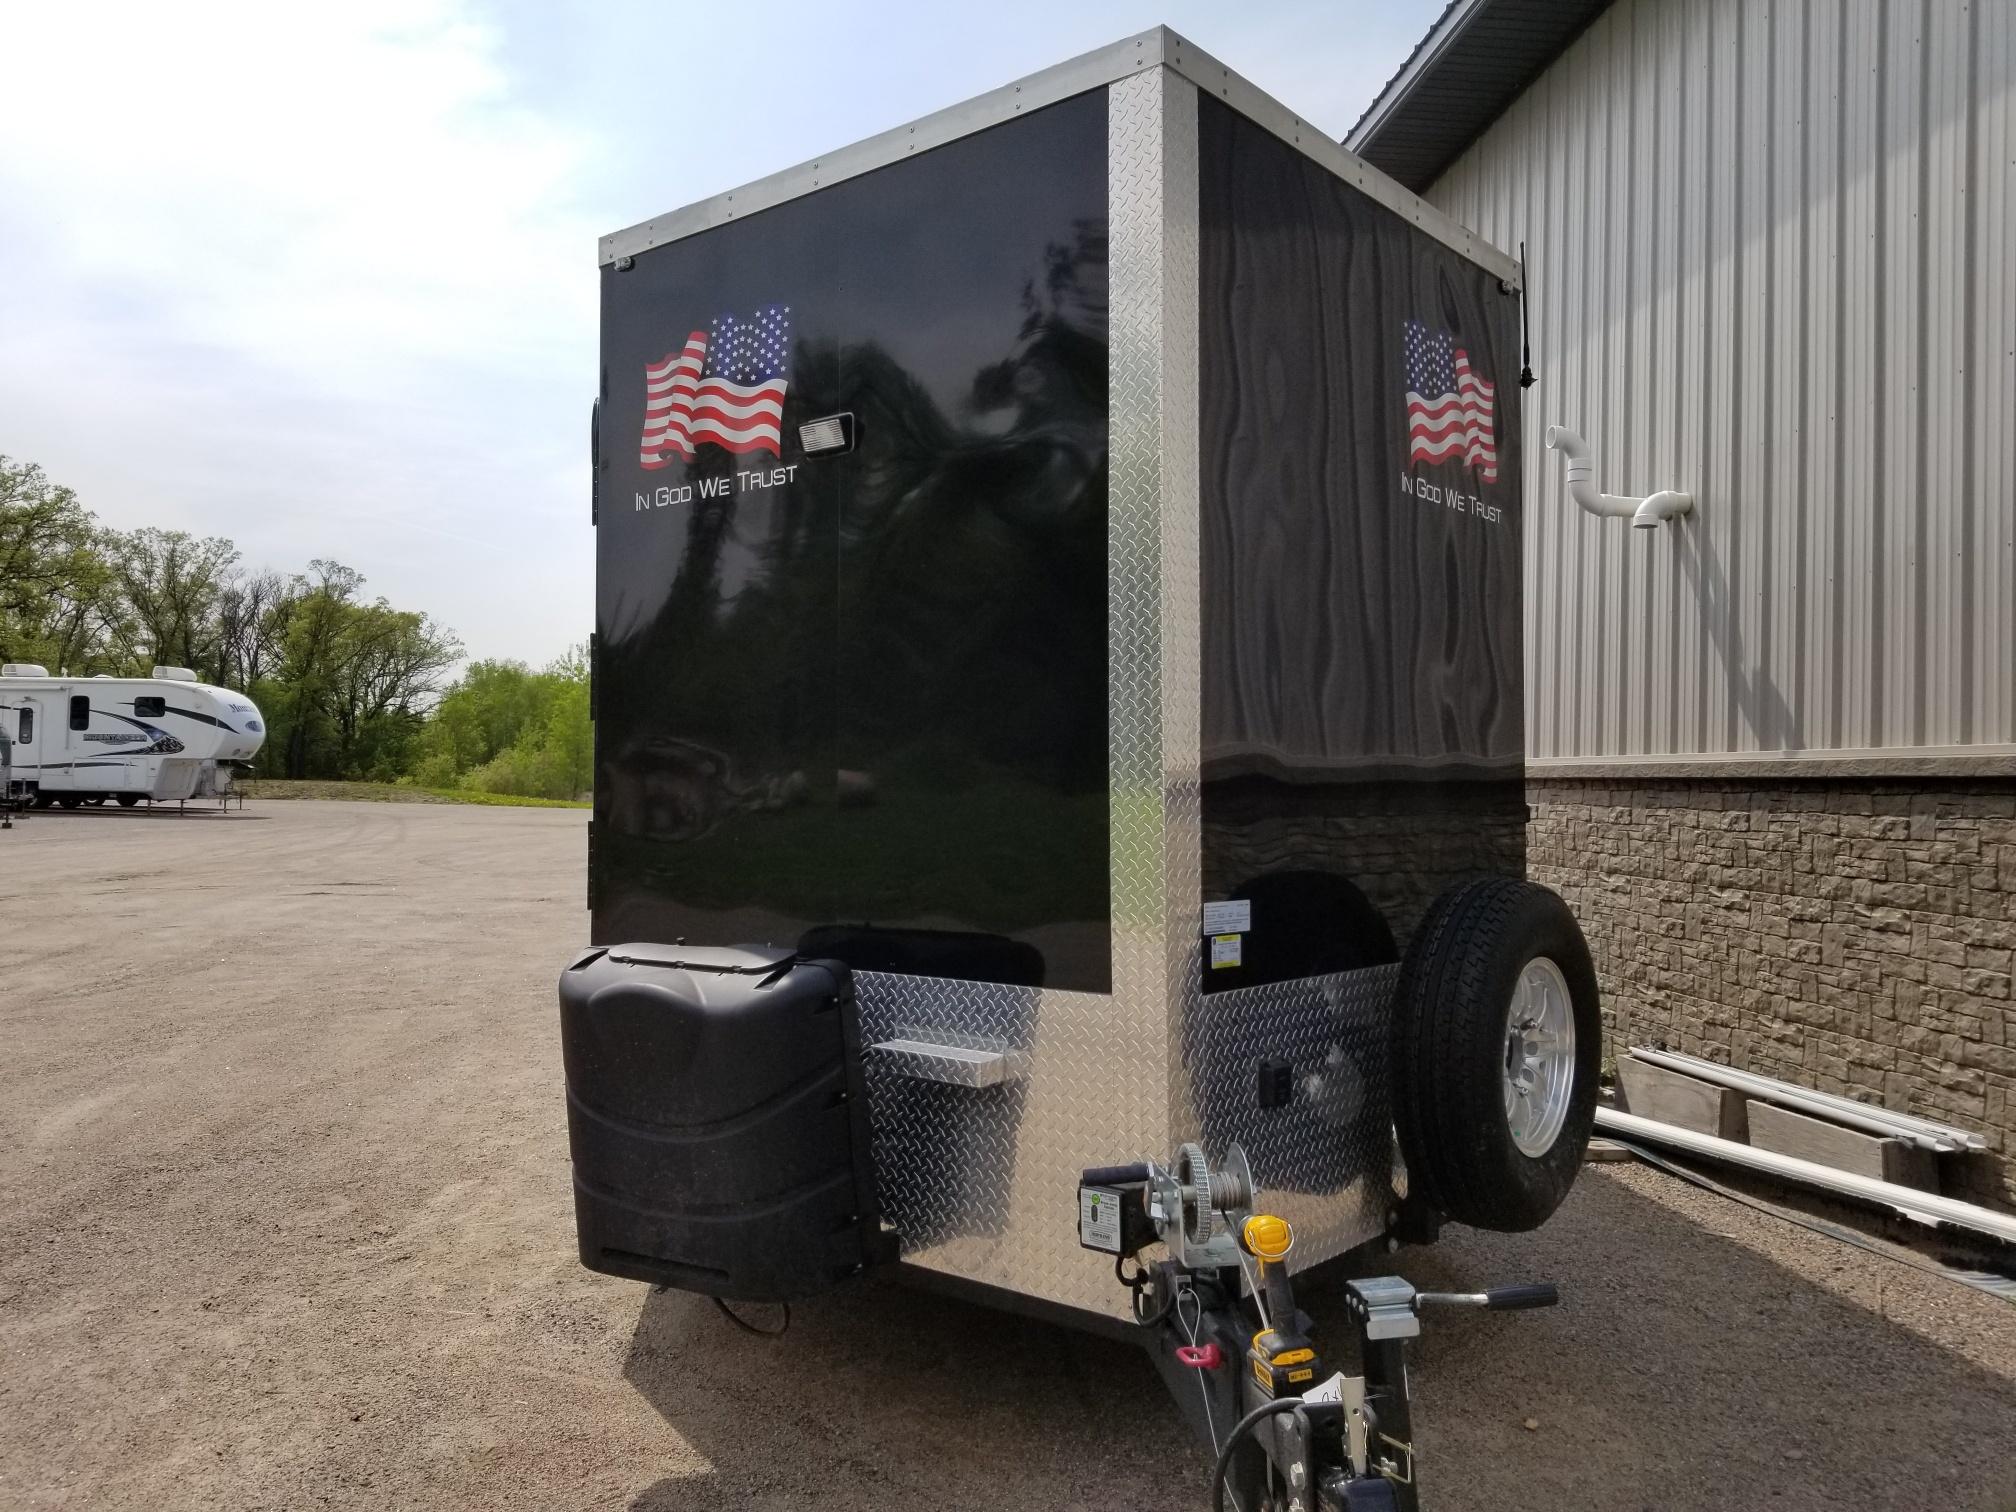 Campers For Sale In Mn >> ALASKAN ELITE, POLAR CRIB FISH HOUSE - ALL Campers - Camper Service, Repair & Customization ...